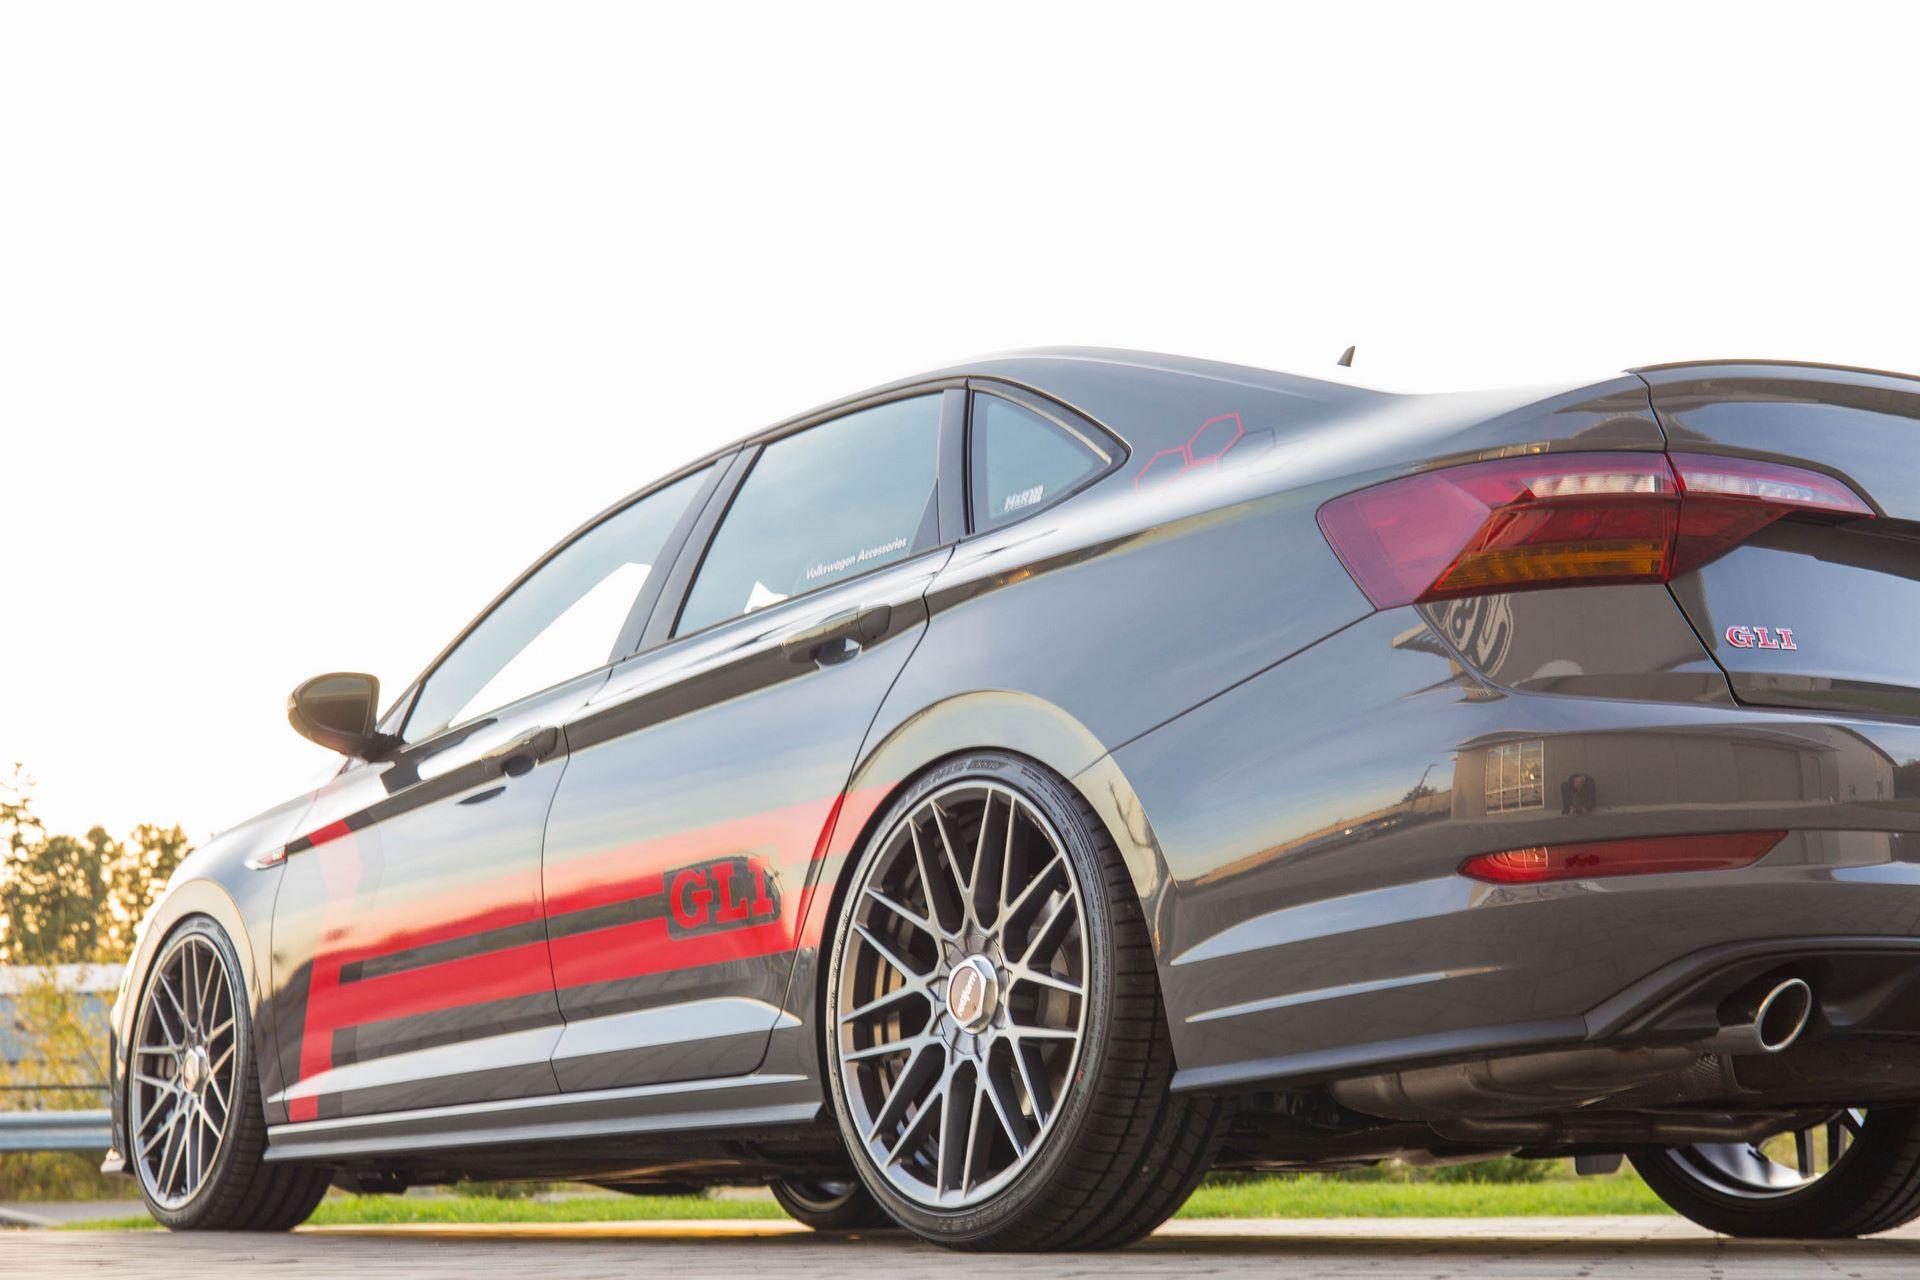 Volkswagen_Jetta_GLI_by_HR_Special_Springs-10431